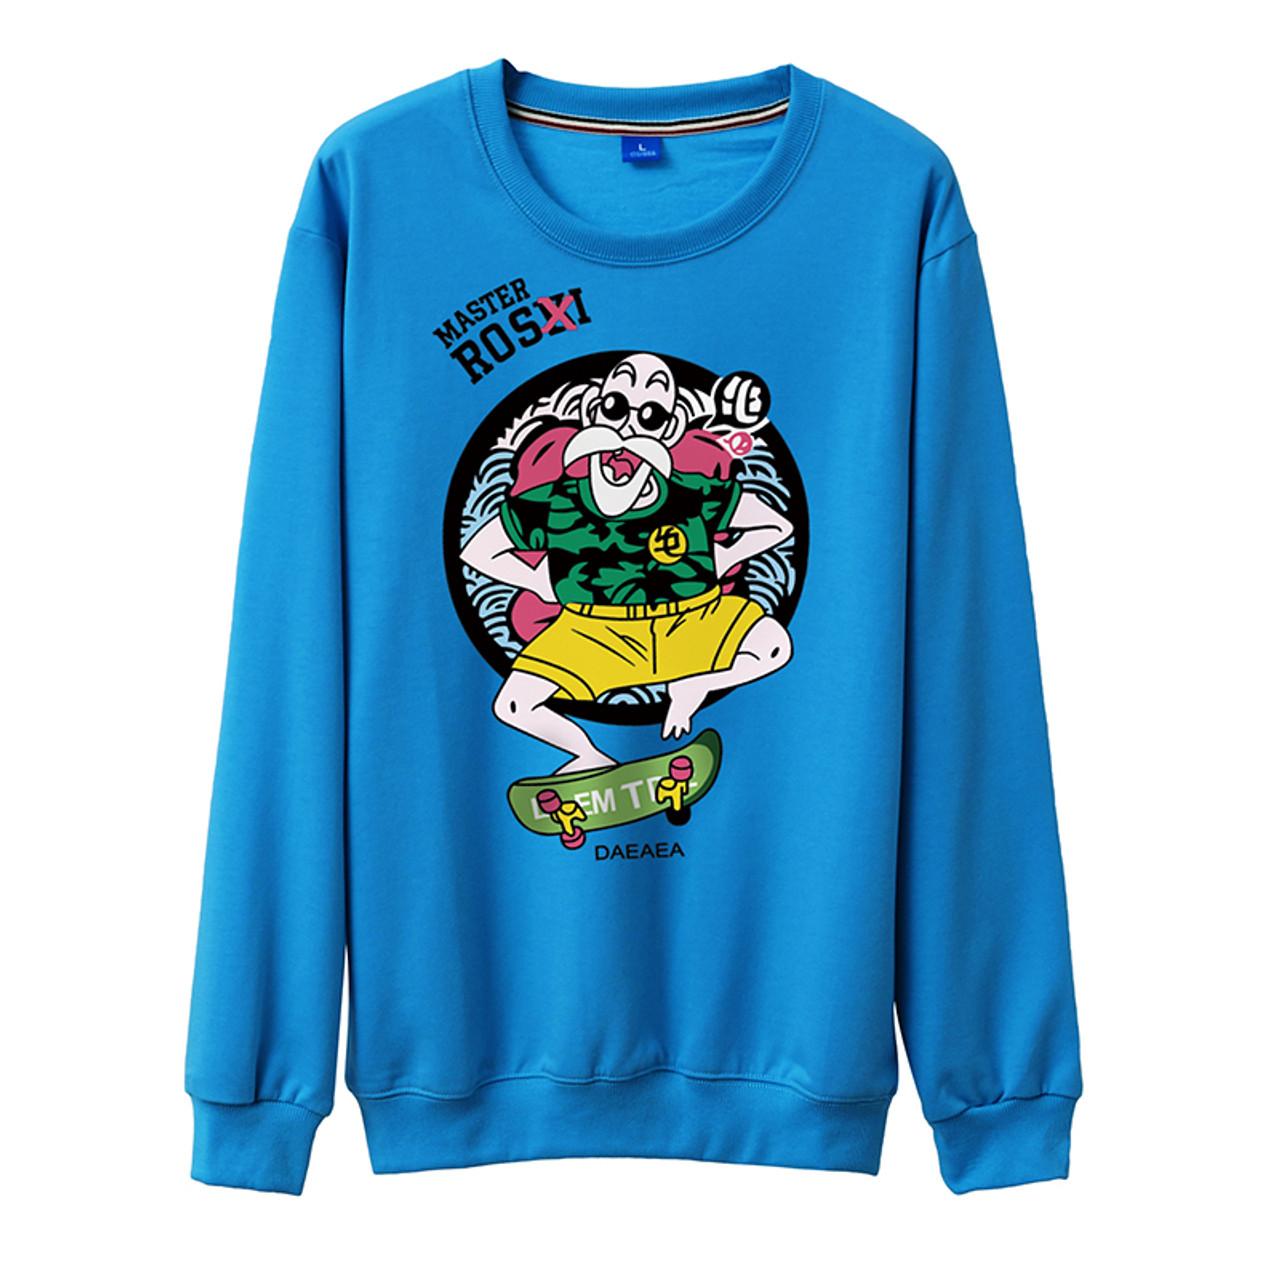 72ba6f07 ... 2018 Women Autumn Casual Hooded Sweatshirt Female Funny Cartoon Printed  Long Sleeve O Neck Pullovers oversized